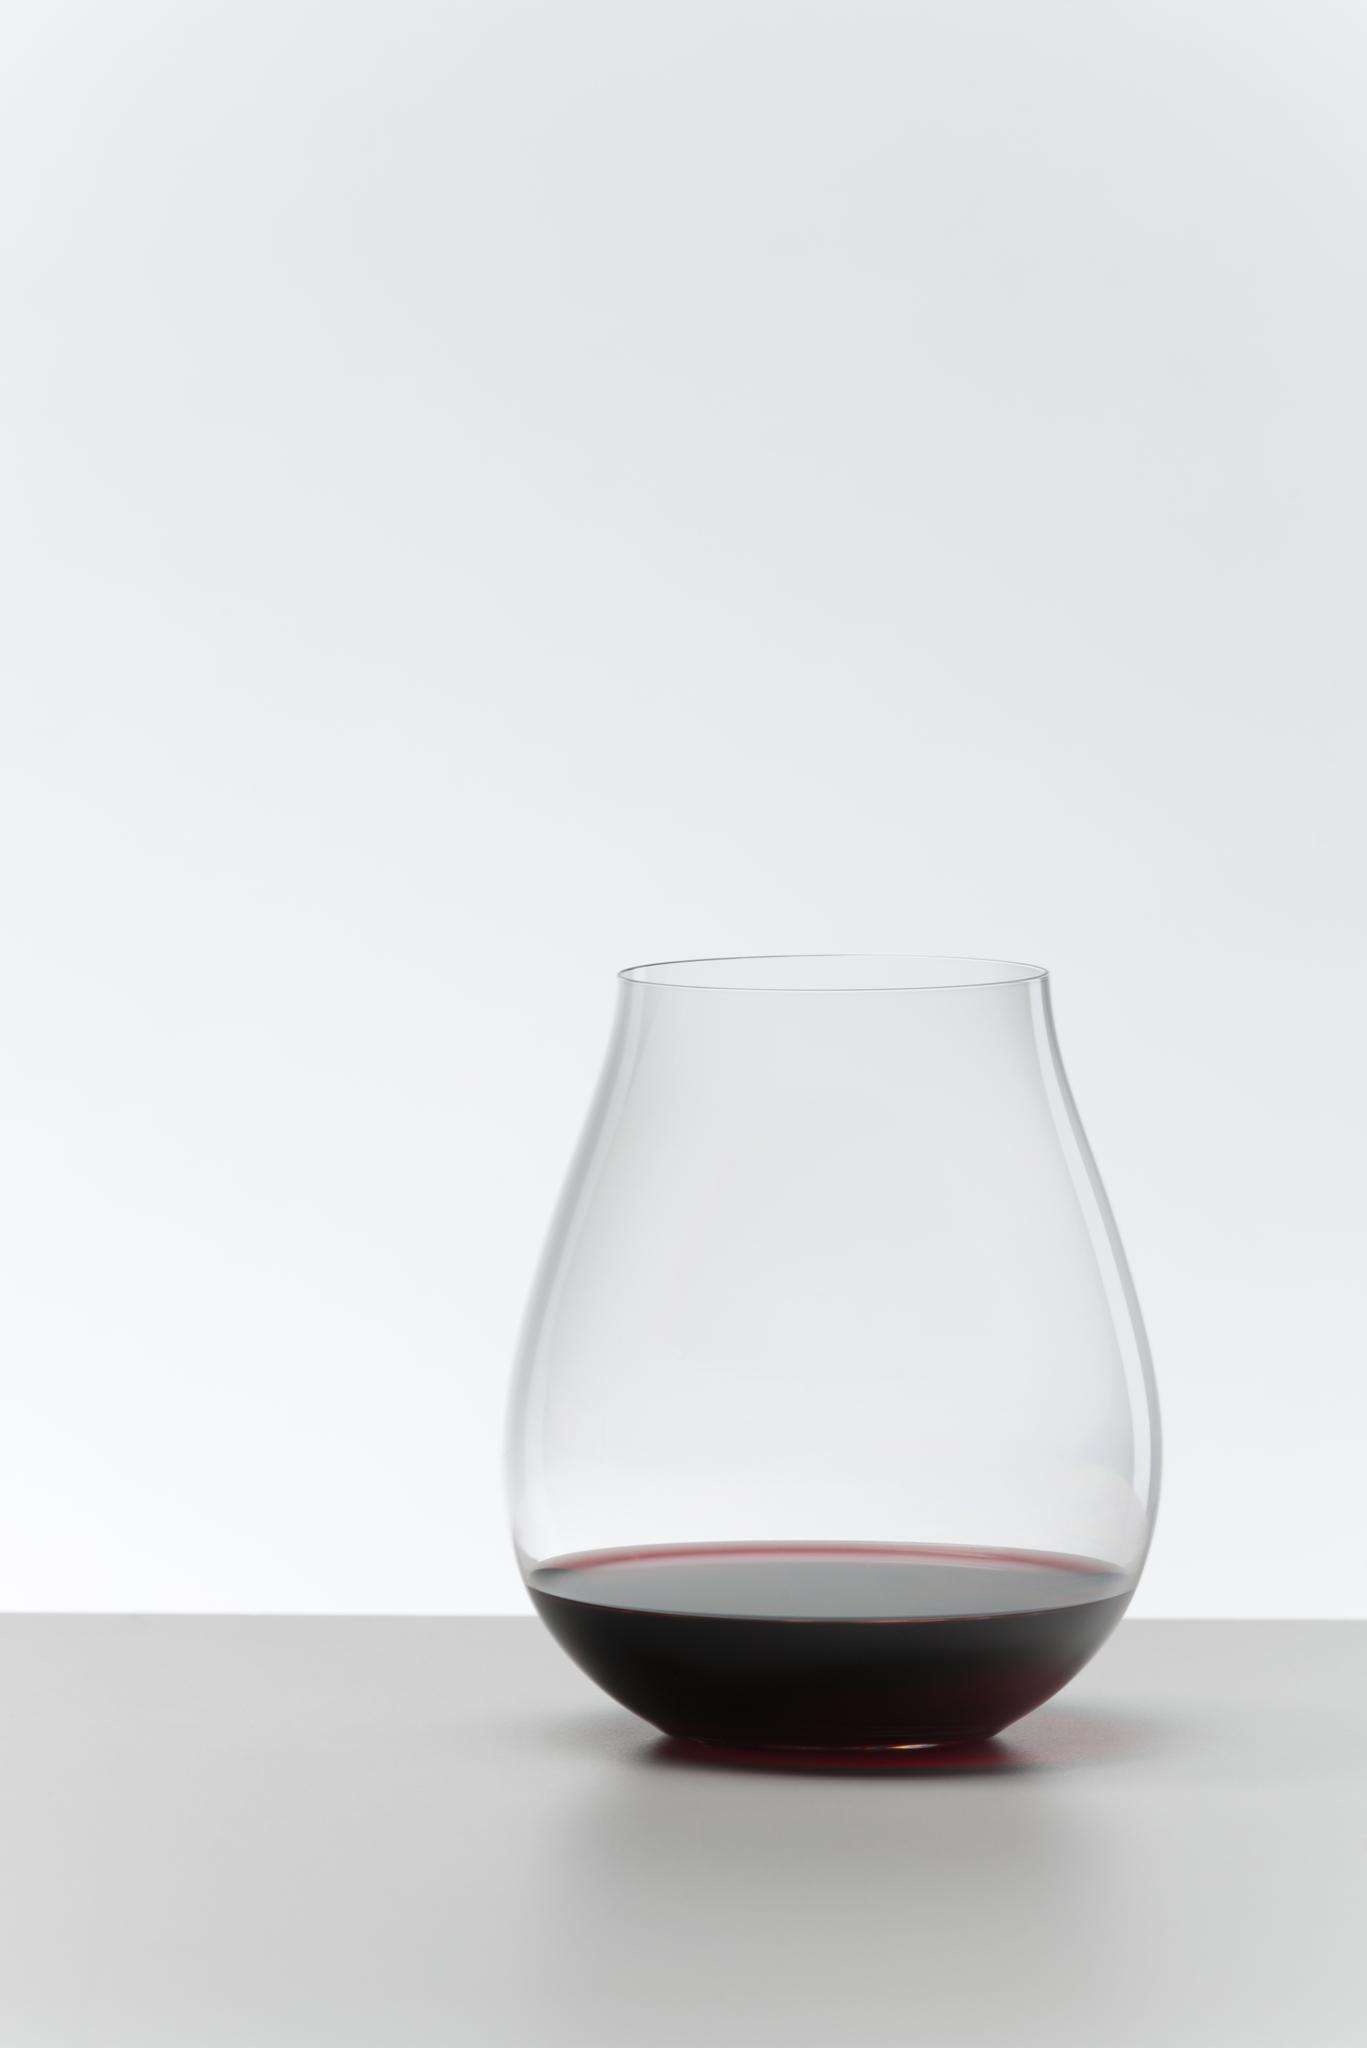 Бокалы Набор бокалов для красного вина 2шт 762мл Riedel The Big O Wine Tumbler Pinot Noir nabor-bokalov-dlya-krasnogo-vina-2-sht-762-ml-riedel-the-big-o-wine-tumbler-pinot-noir-avstriya.jpg